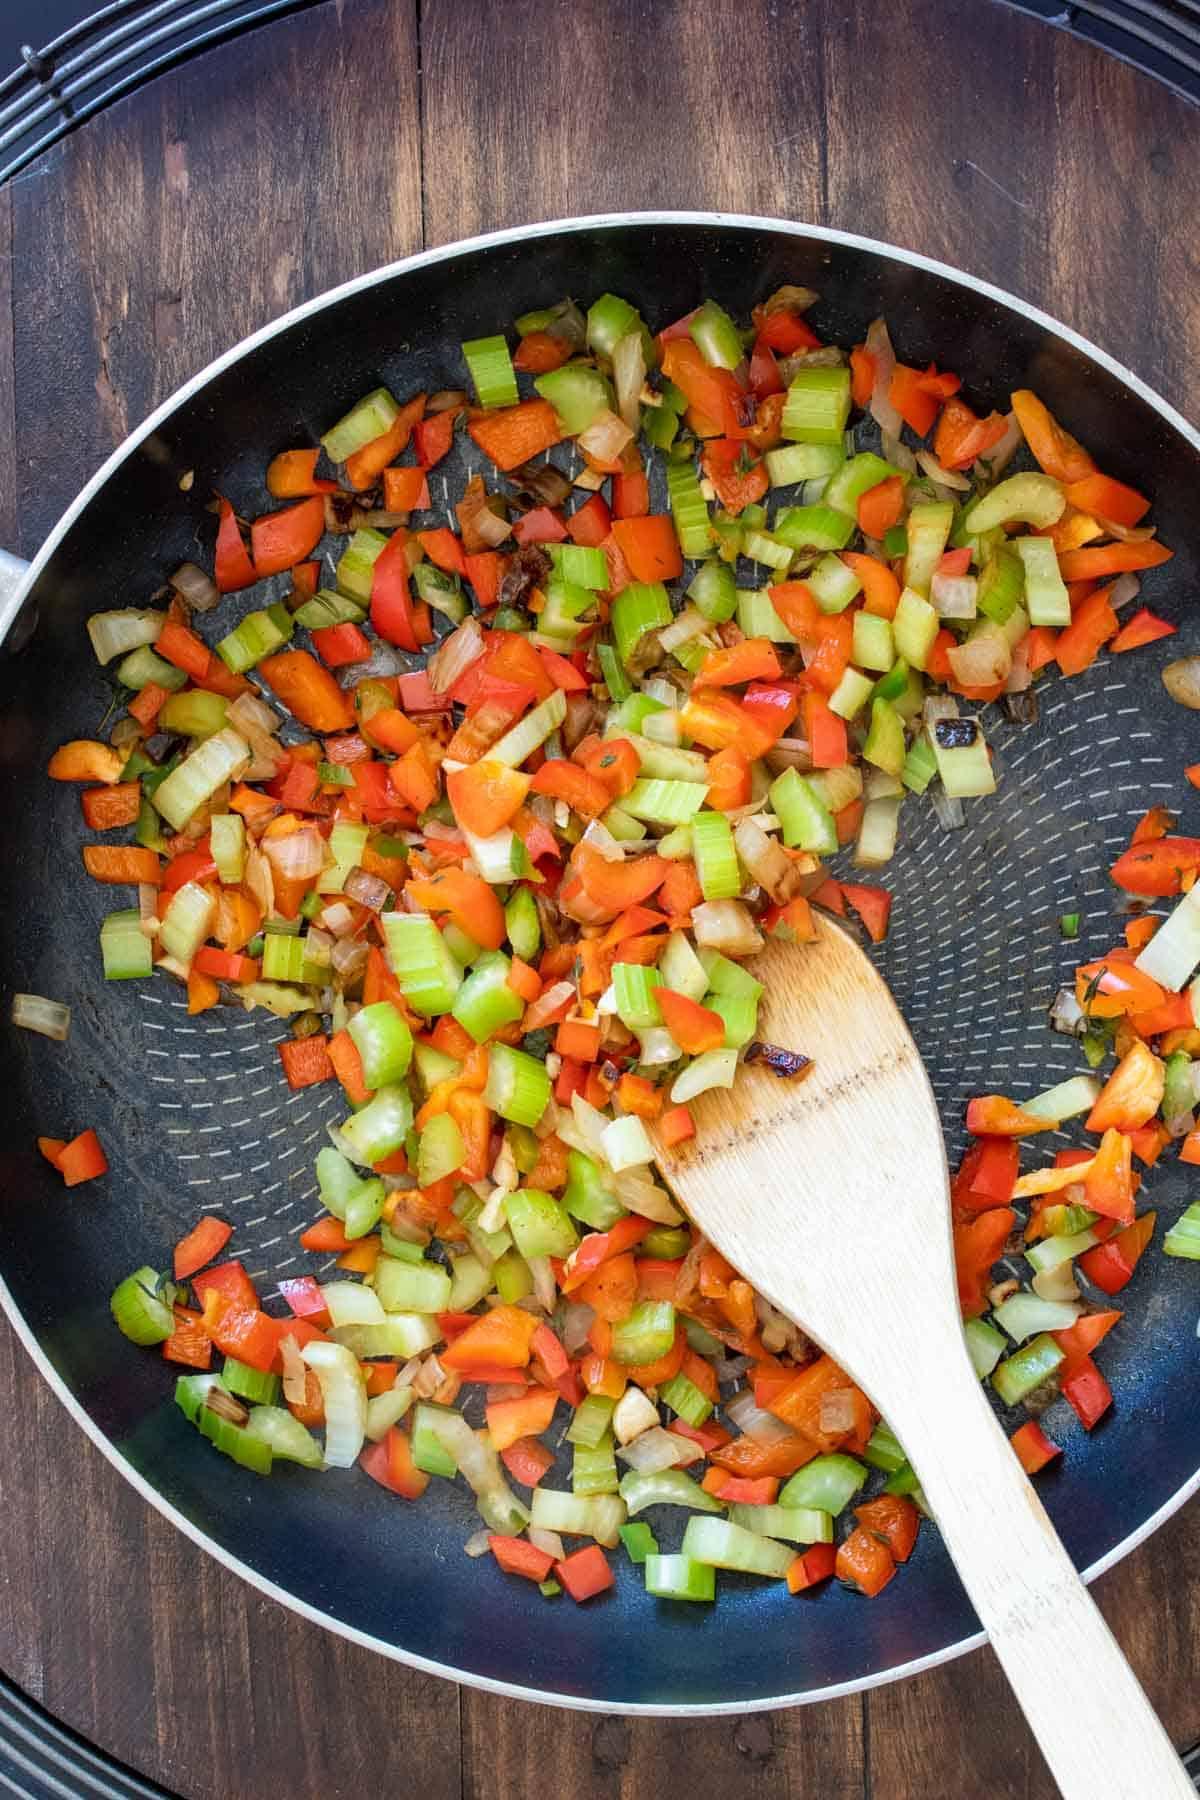 Wooden spoon stirring chopped veggies in a pan